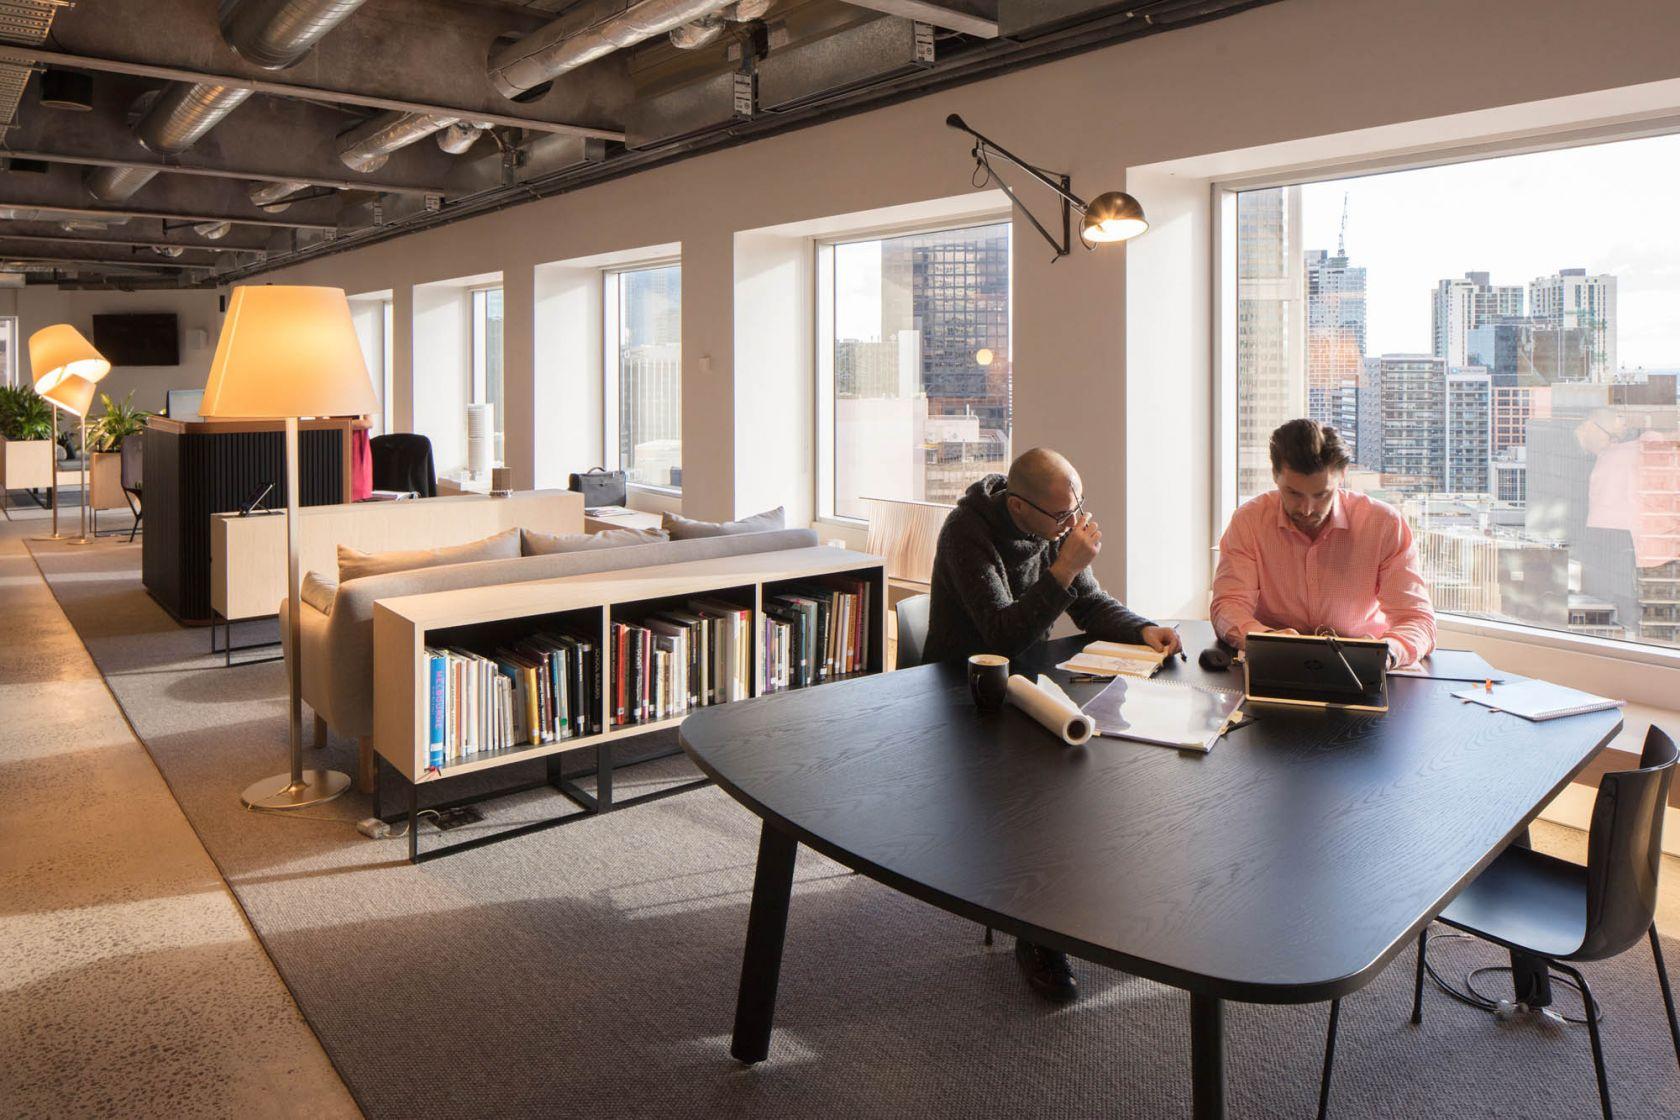 architectus melbourne office fitout collaboration area